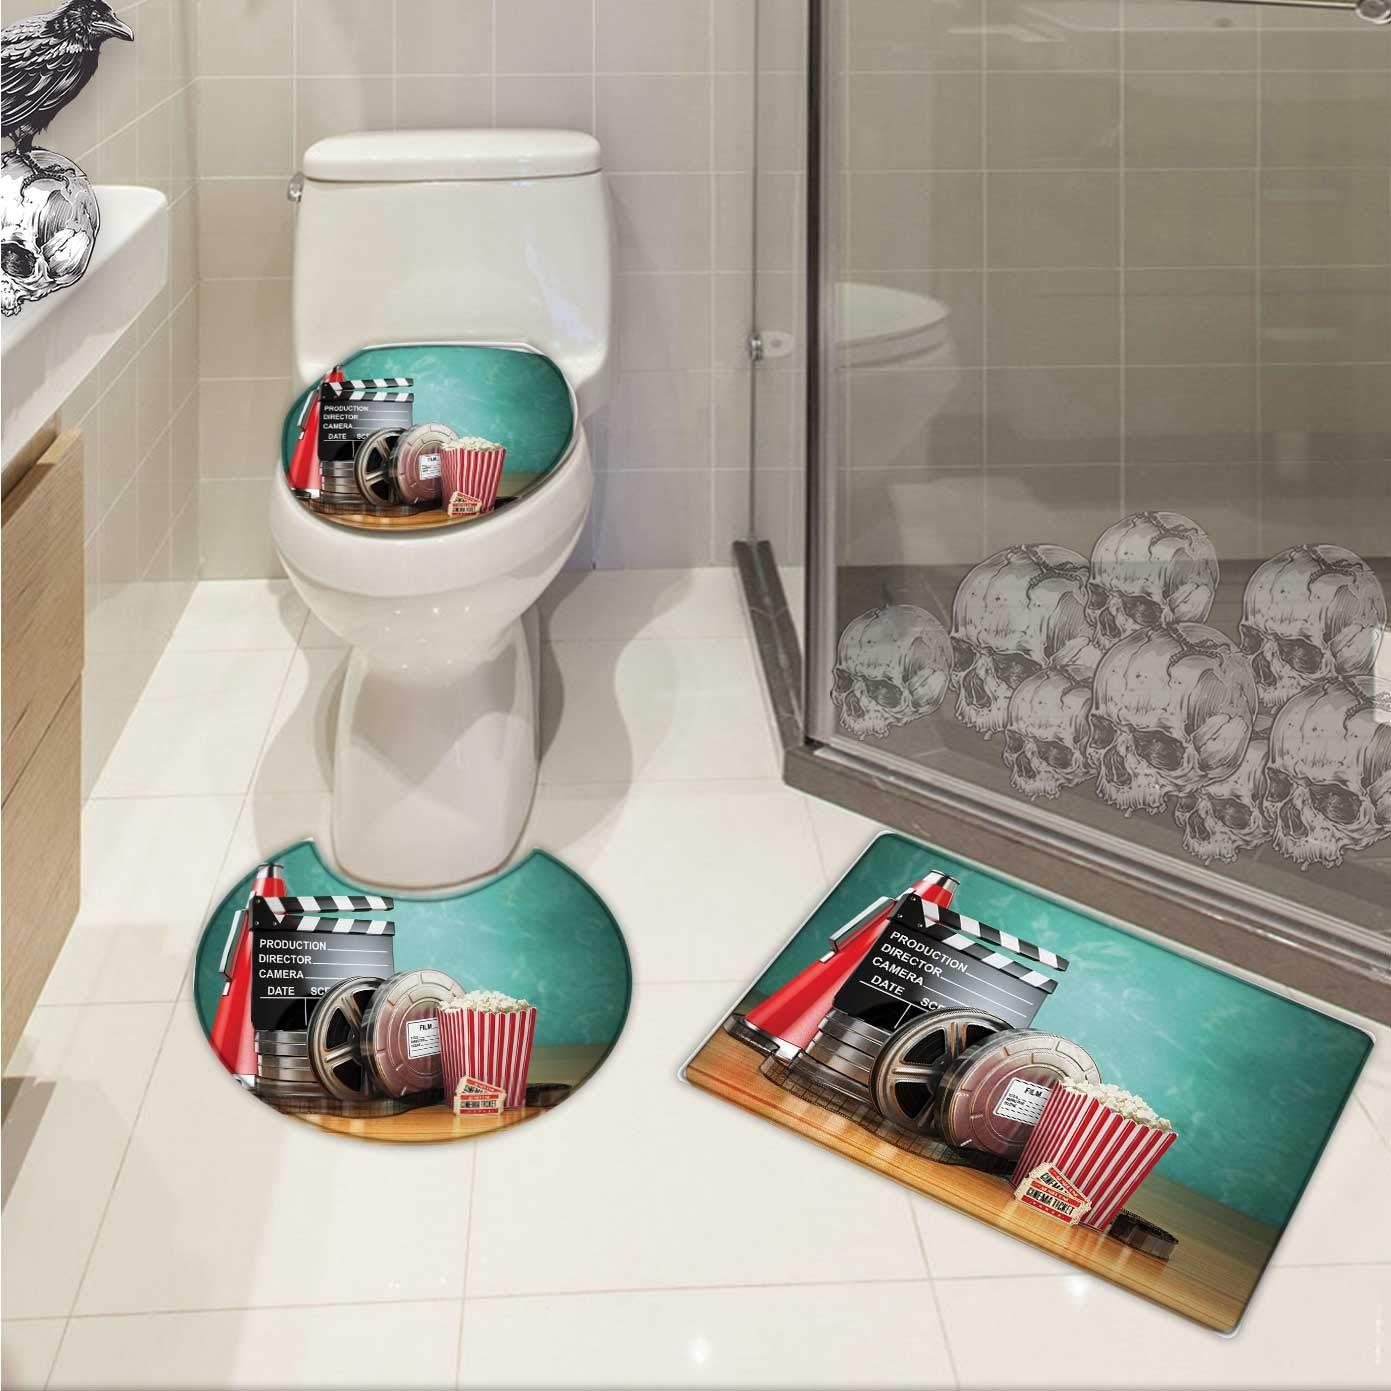 Carl Morris Movie Theater 3 piece toilet mat set Production Theme 3D Film Reels Clapperboard Tickets Popcorn and Megaphone 3 Piece Shower Mat set Multicolor by Carl Morris